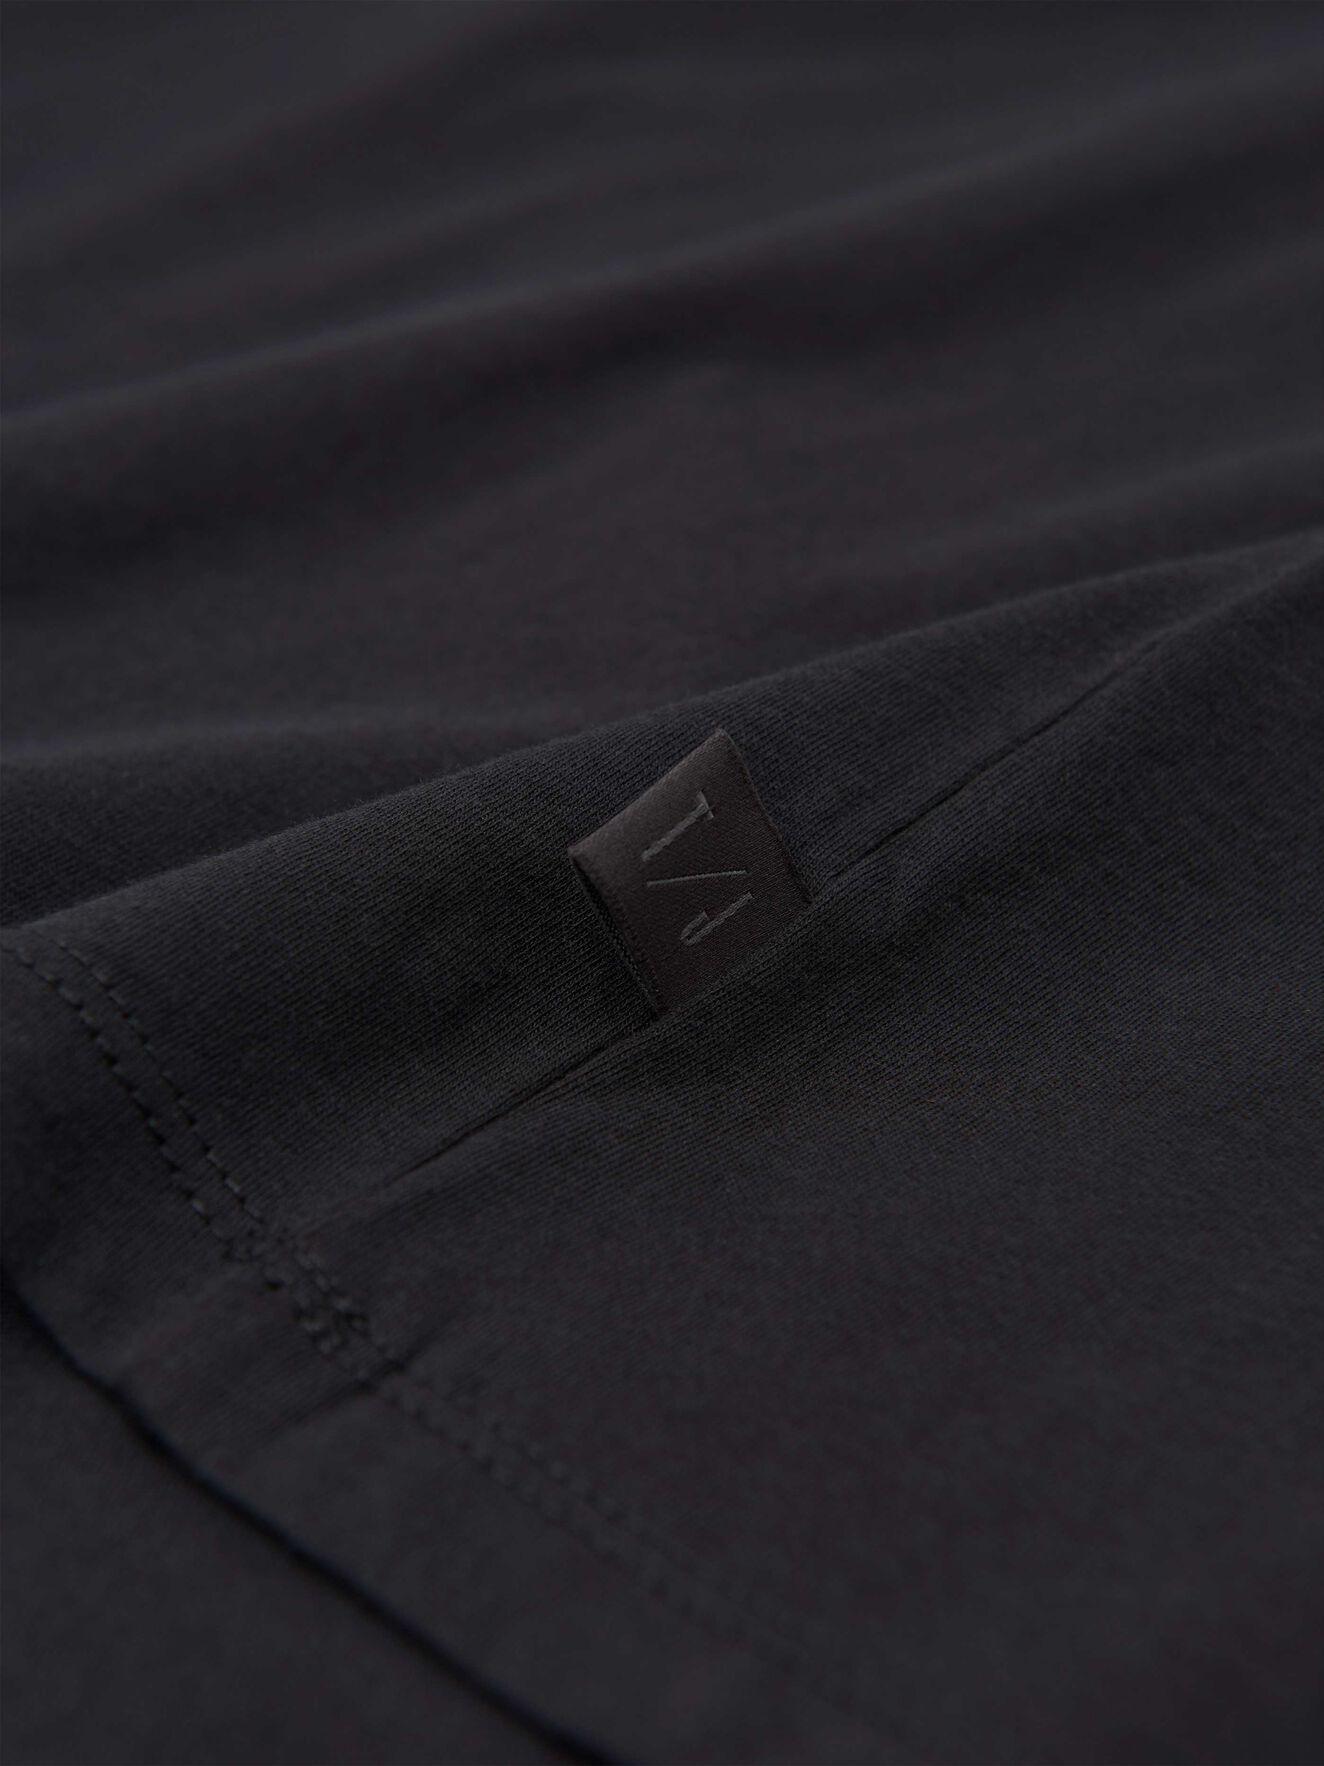 Fleek T-Shirt in Black from Tiger of Sweden